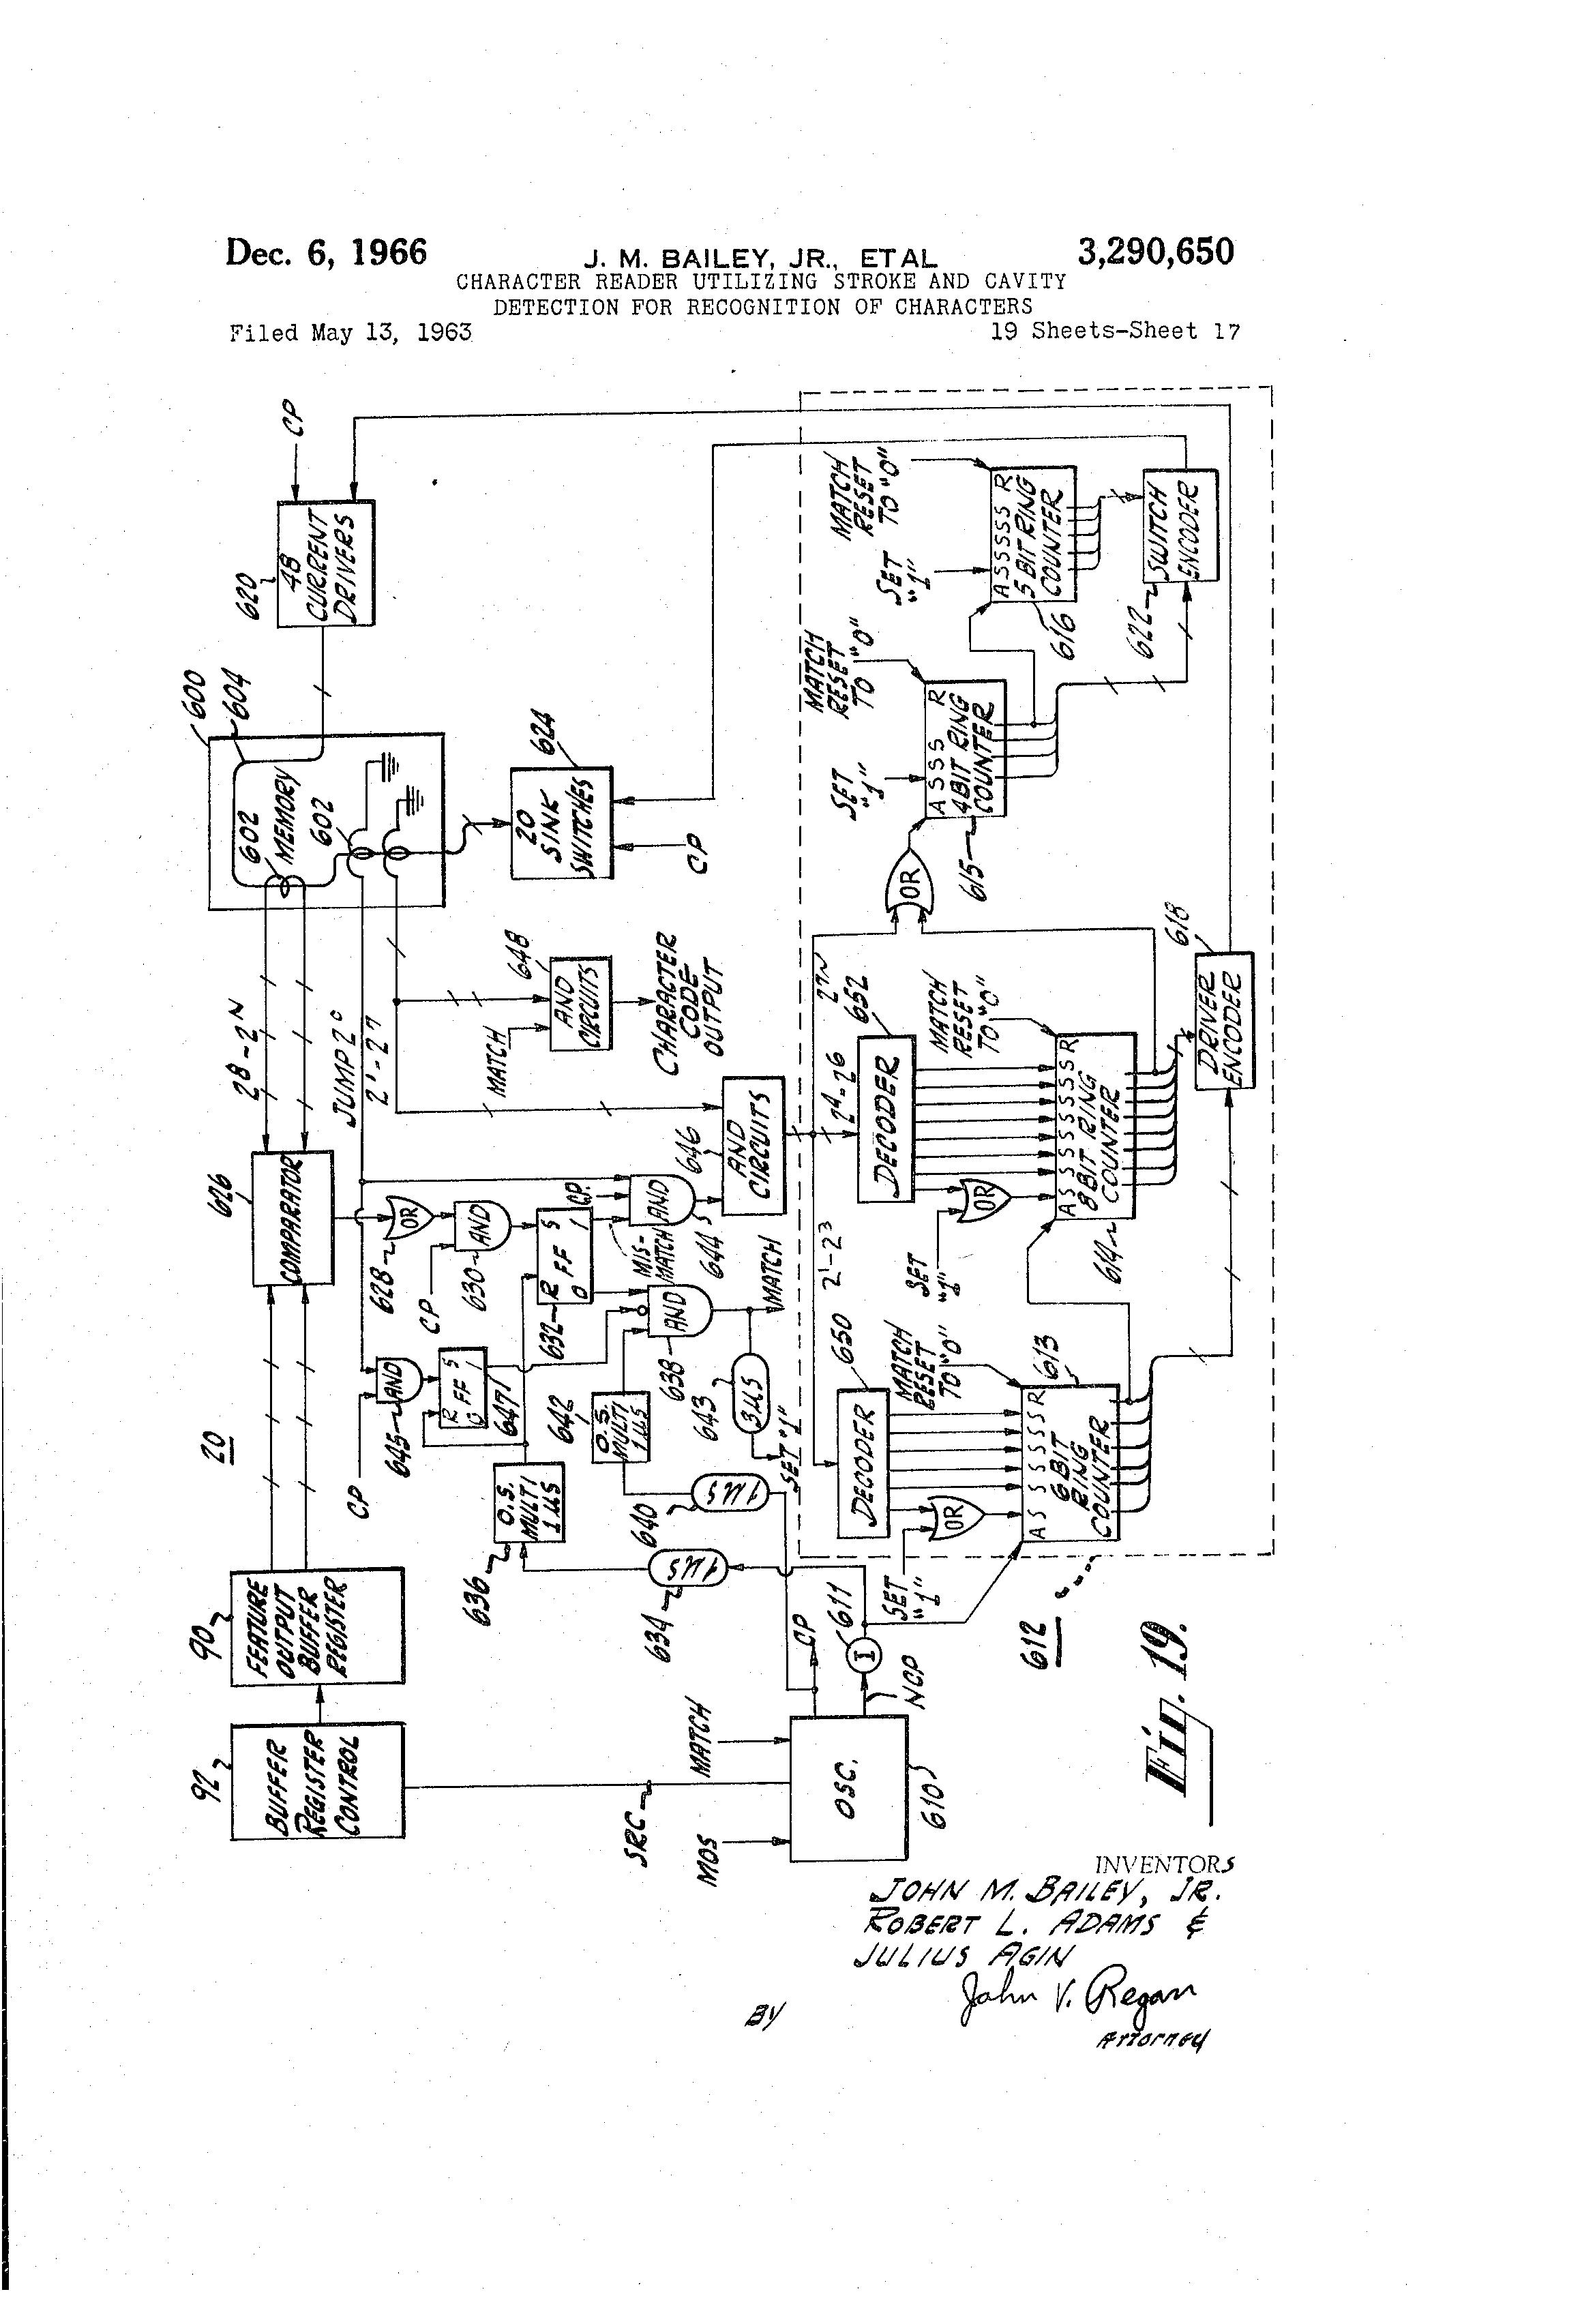 US3290650 16?resize\\\\\\\=665%2C977\\\\\\\&ssl\\\\\\\=1 kone crane wiring diagram konecranes cxt manual \u2022 free wiring Simple Wiring Schematics at panicattacktreatment.co